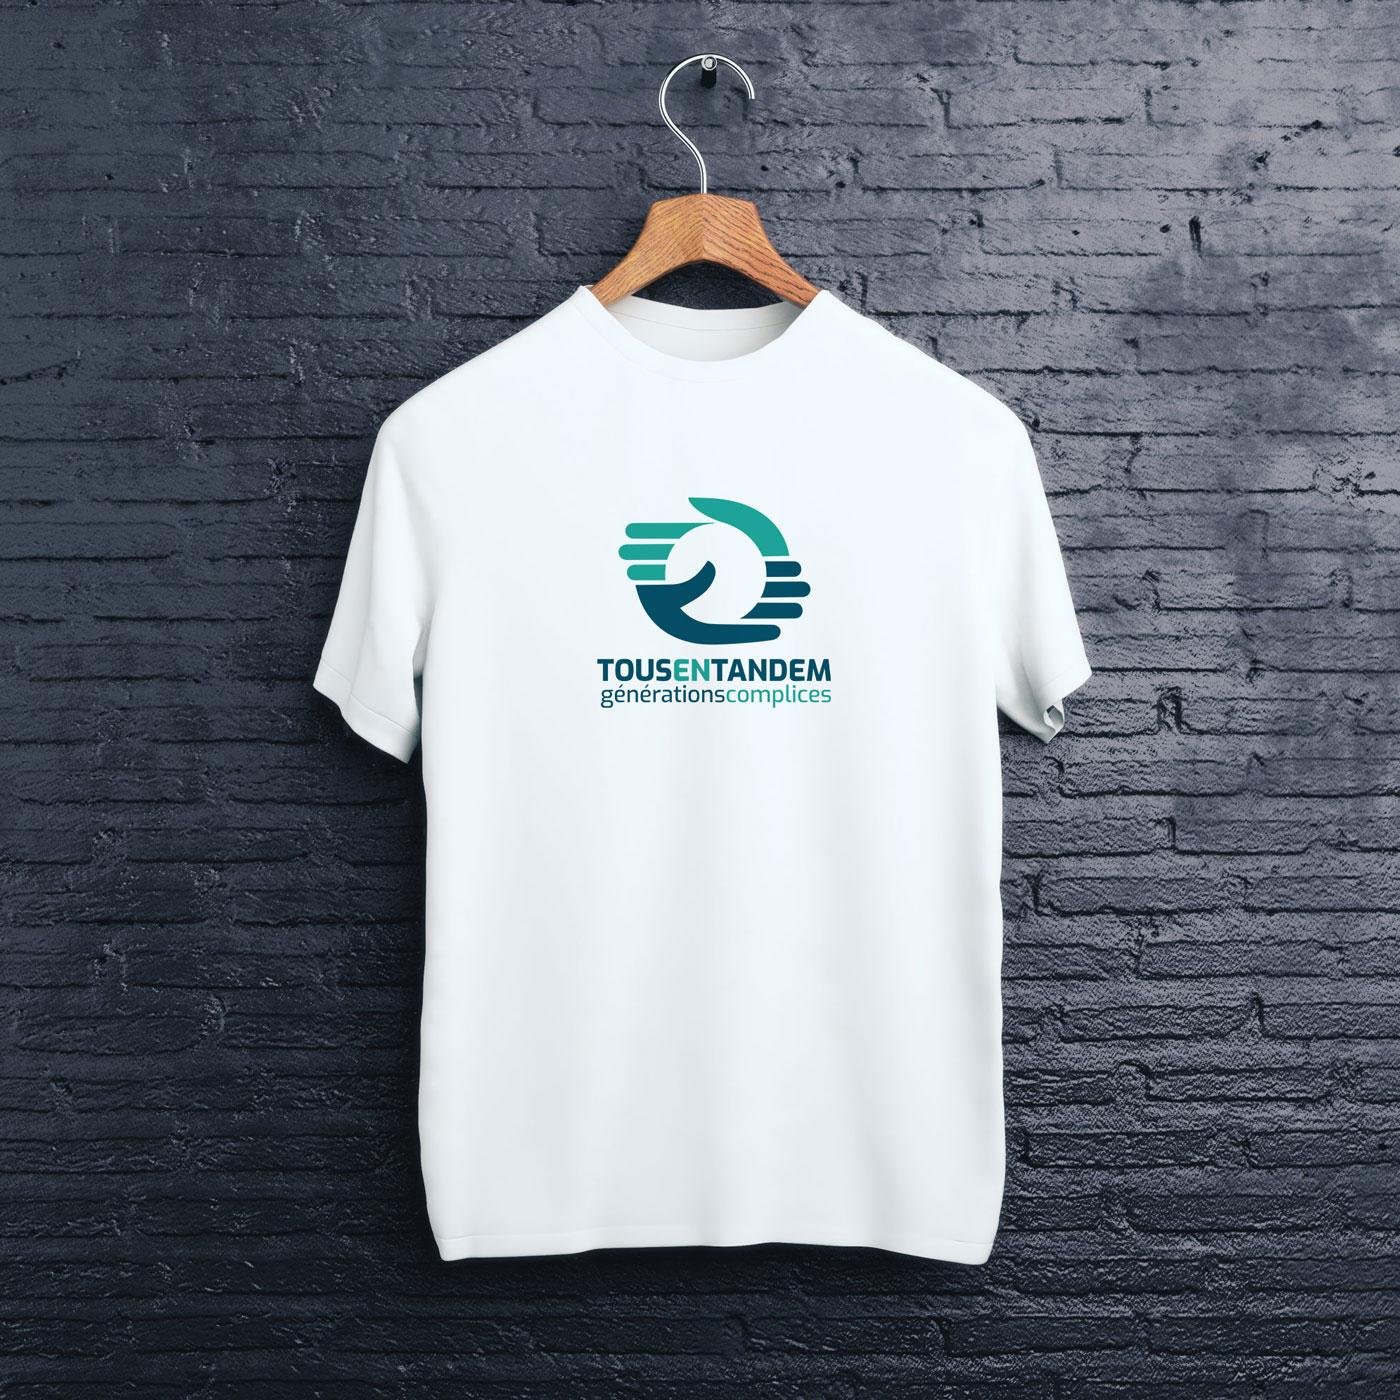 tous-en-tandem-logo-tee-shirt